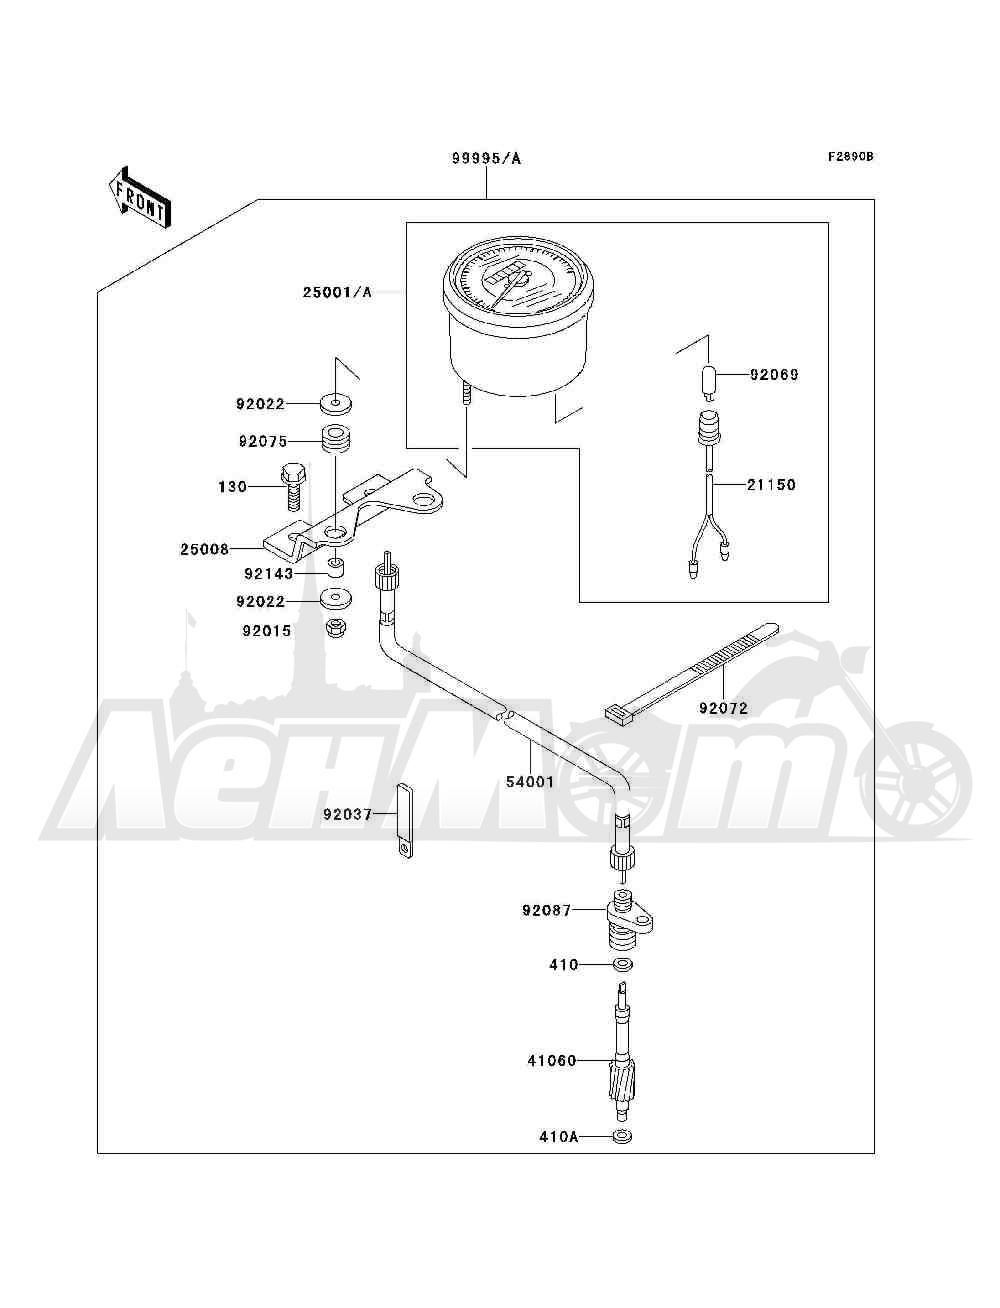 Запчасти для Квадроцикла Kawasaki 1993 BAYOU 300 4X4 (KLF300-C5) Раздел: OPTIONAL PARTS(METER) | опционально детали (счетчик)